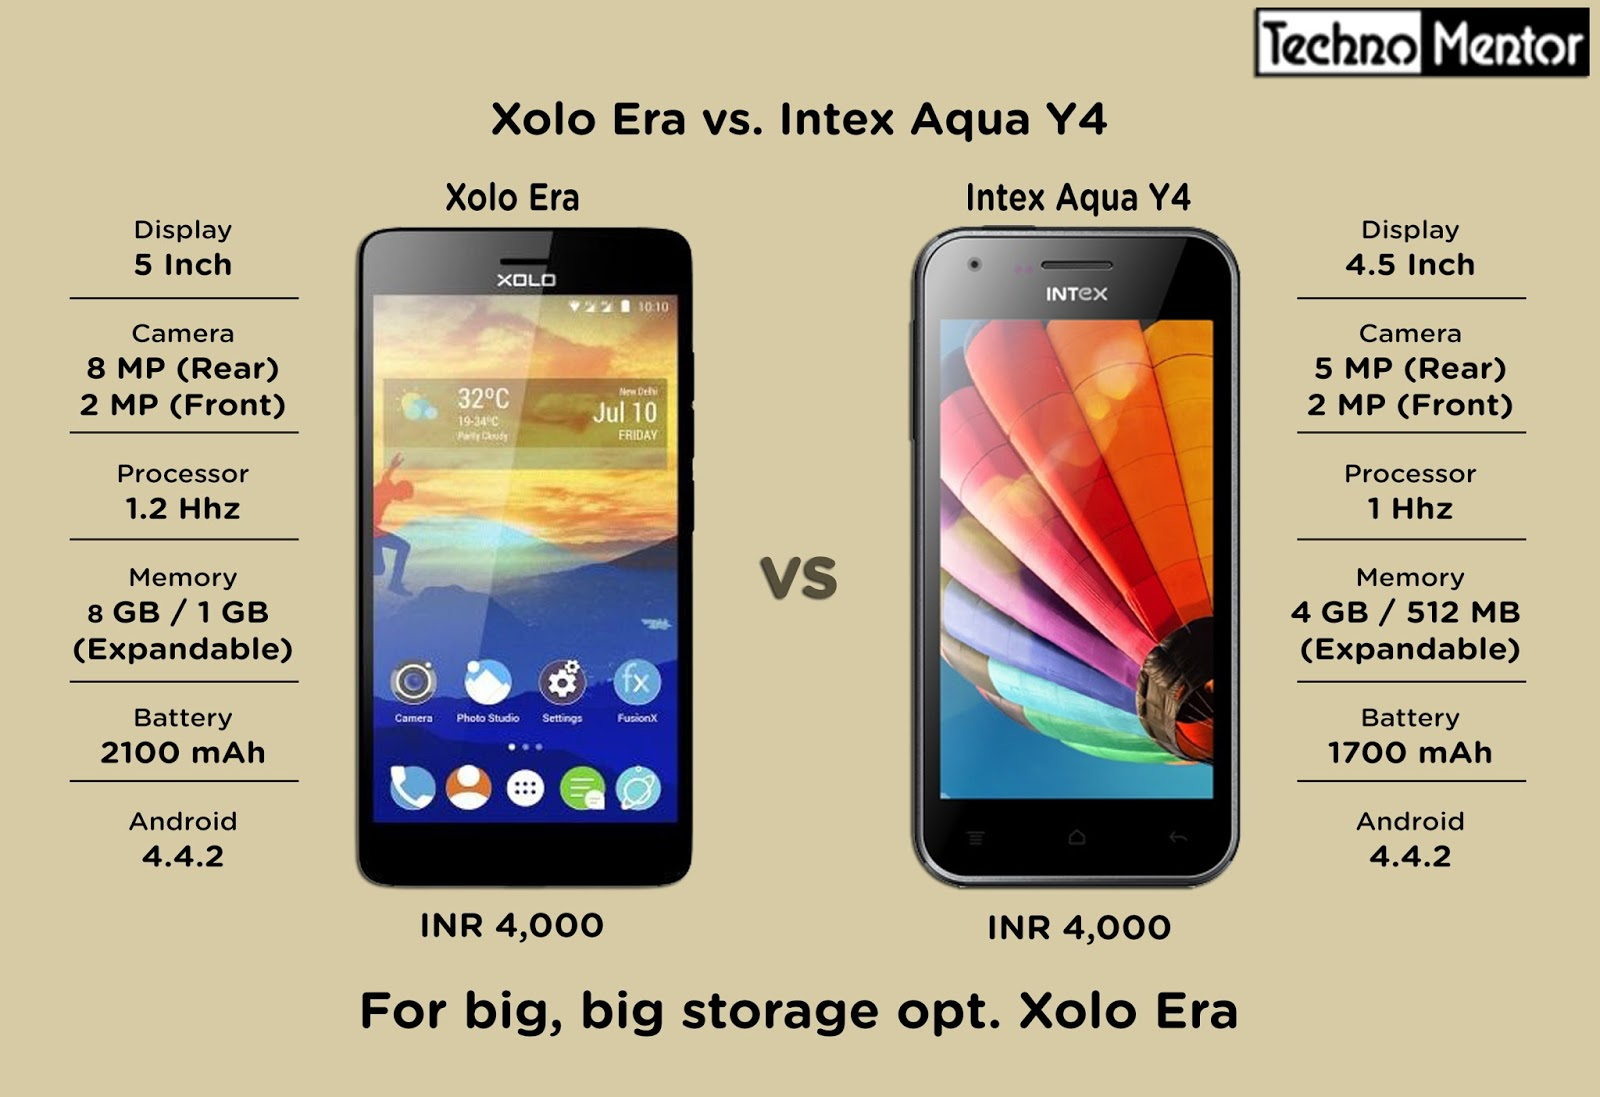 The Techno Mentor: Xolo Era with its double RAM beats Intex Aqua Y4